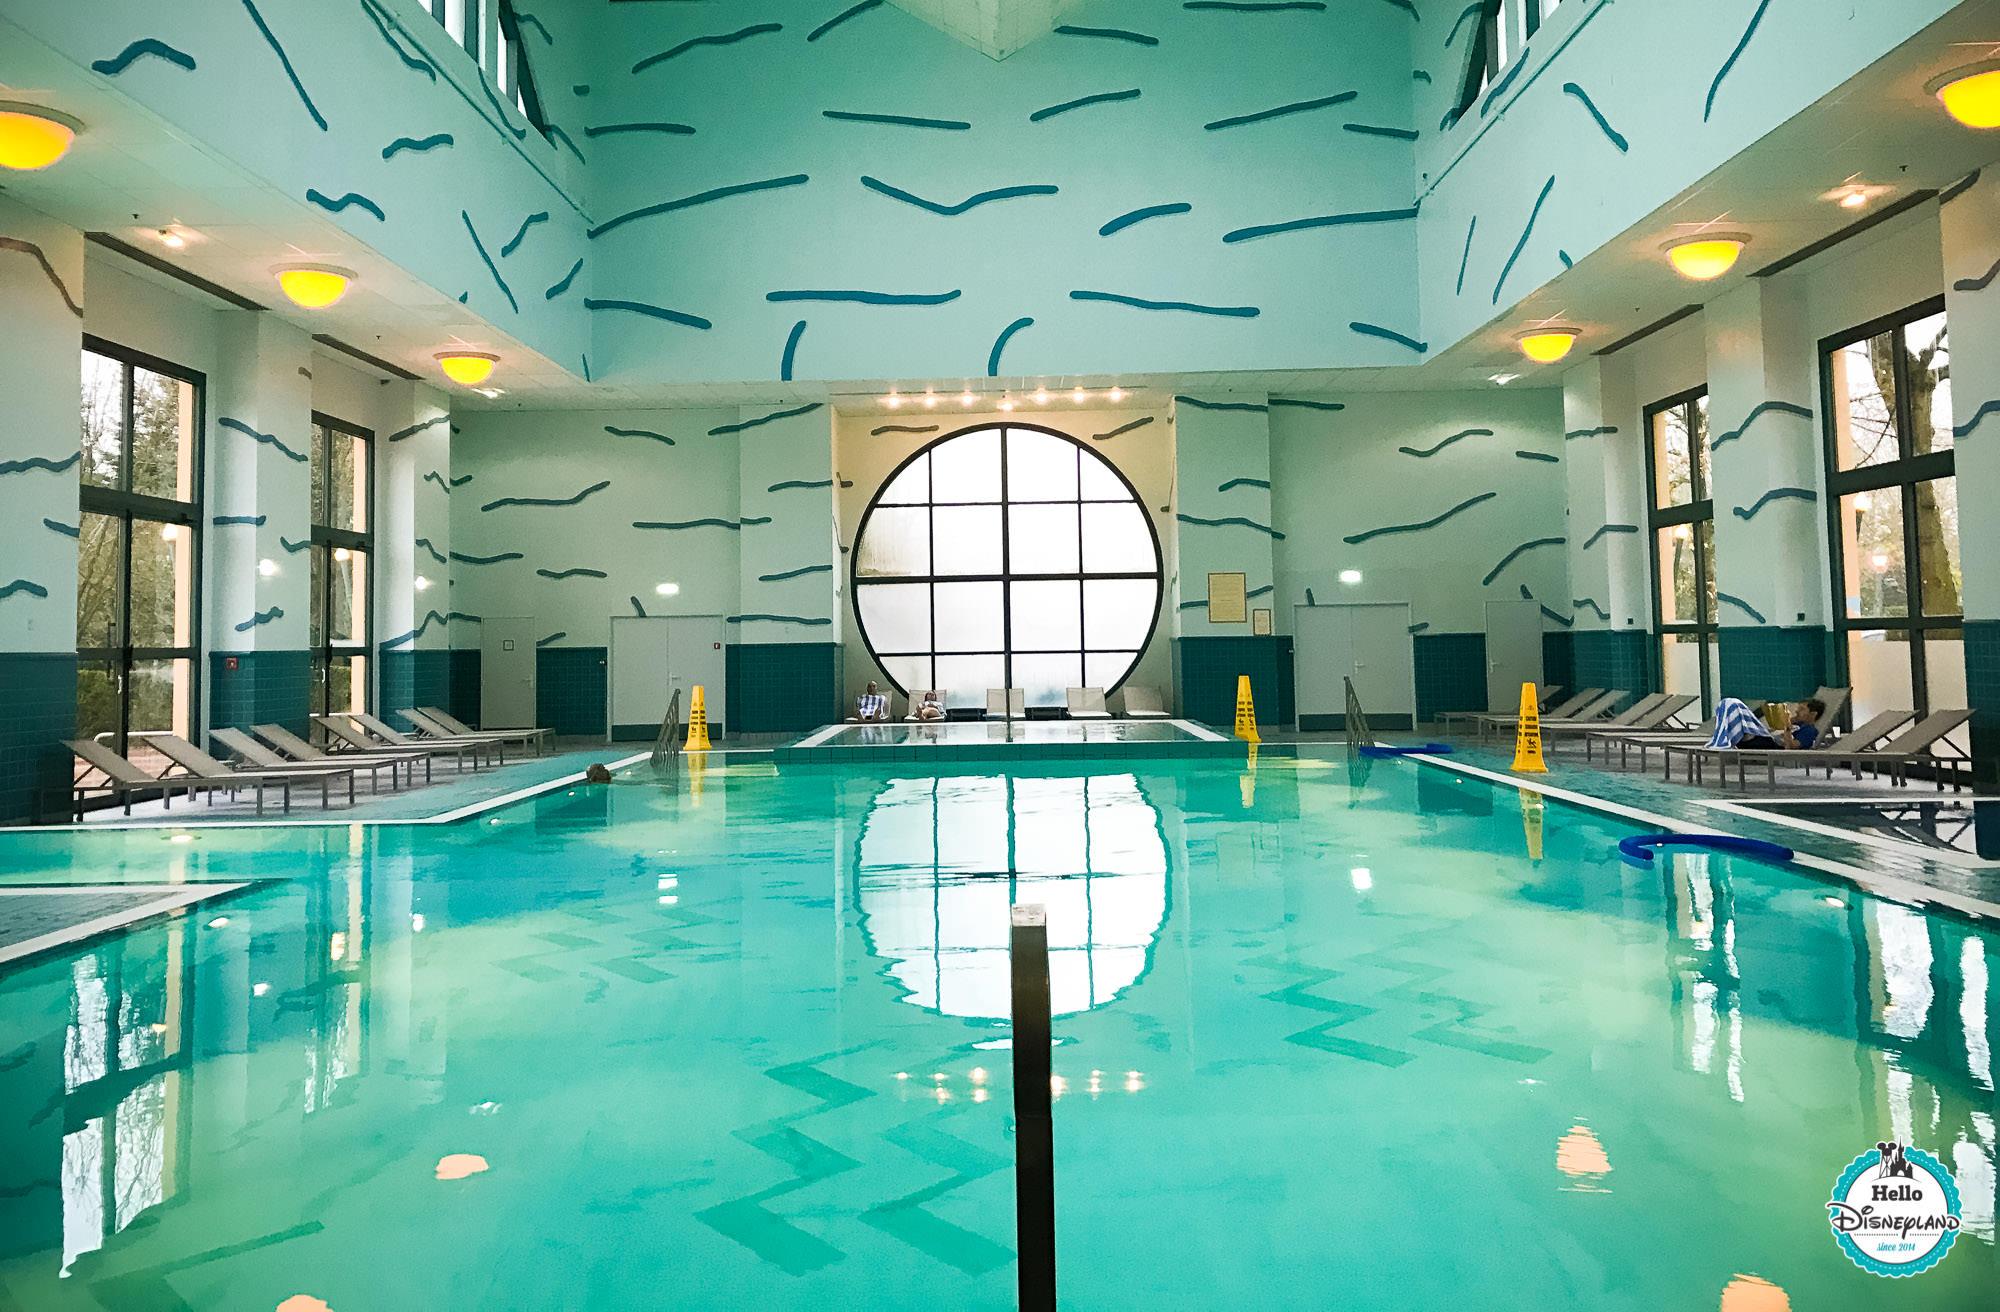 Hello disneyland le blog n 1 sur disneyland paris for Hotel avec piscine new york